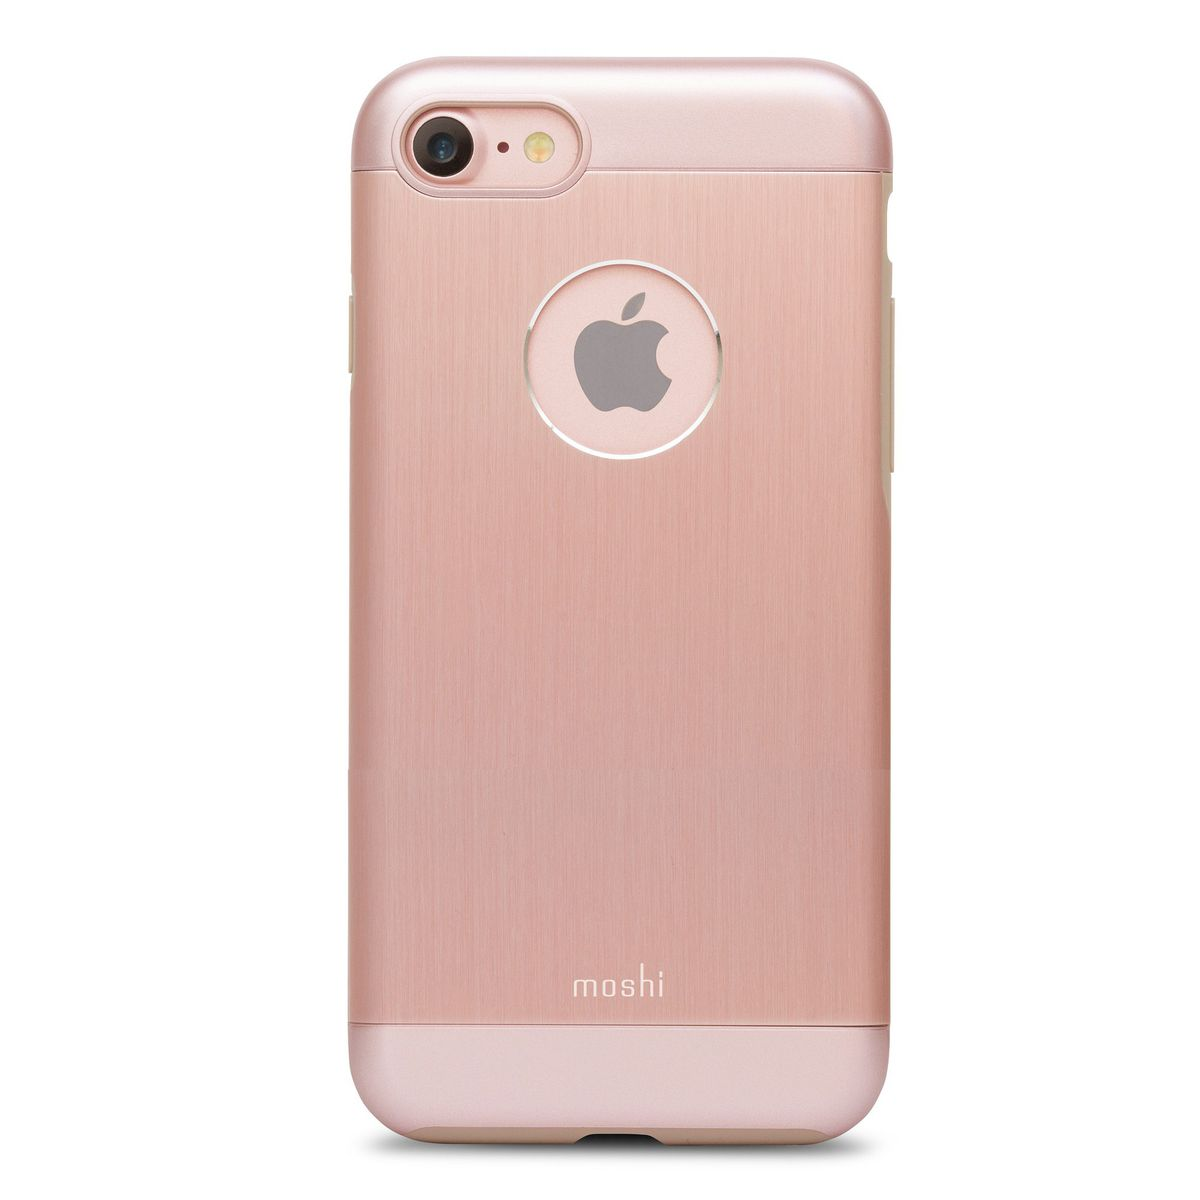 moshi armour case for apple iphone 7 golden rose buy. Black Bedroom Furniture Sets. Home Design Ideas